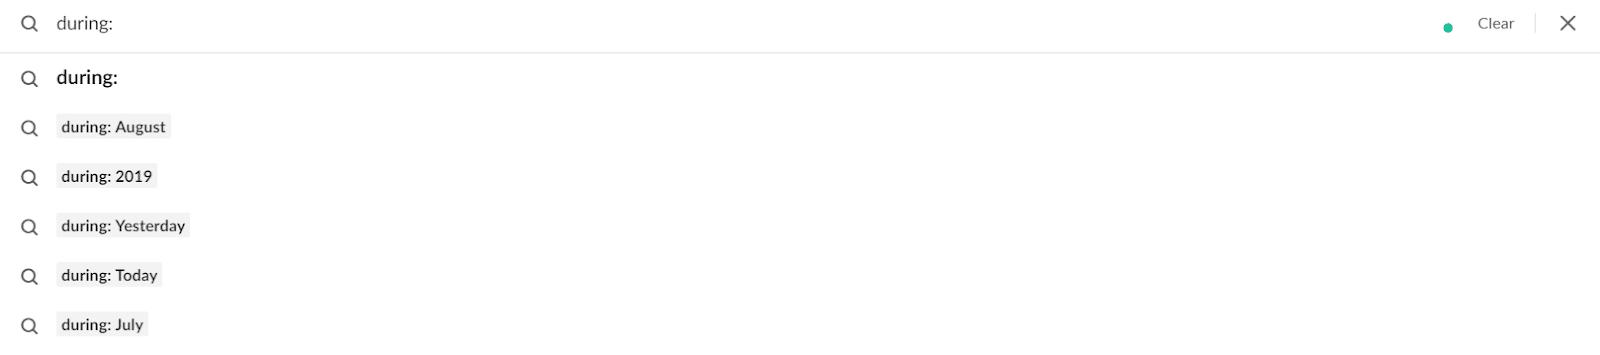 "Parâmetro de procura de Slack ""durante:"""